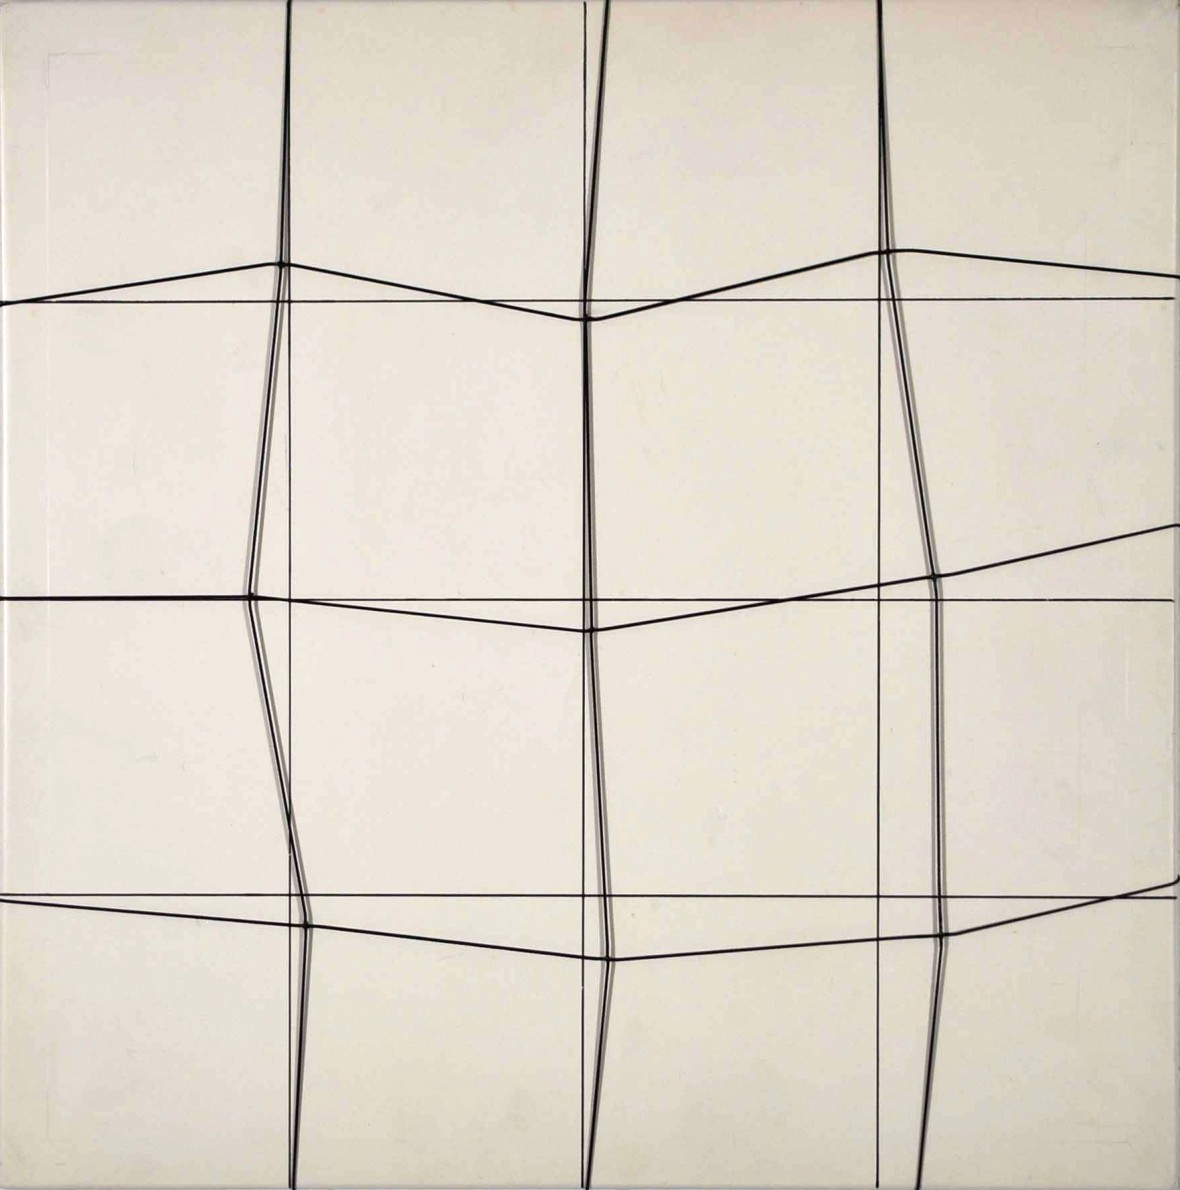 <p><b>Gianni Colombo, </b><em>Senza titolo (</em><i>Untitled),</i> 1974/77<br /> <br /><br /></p>